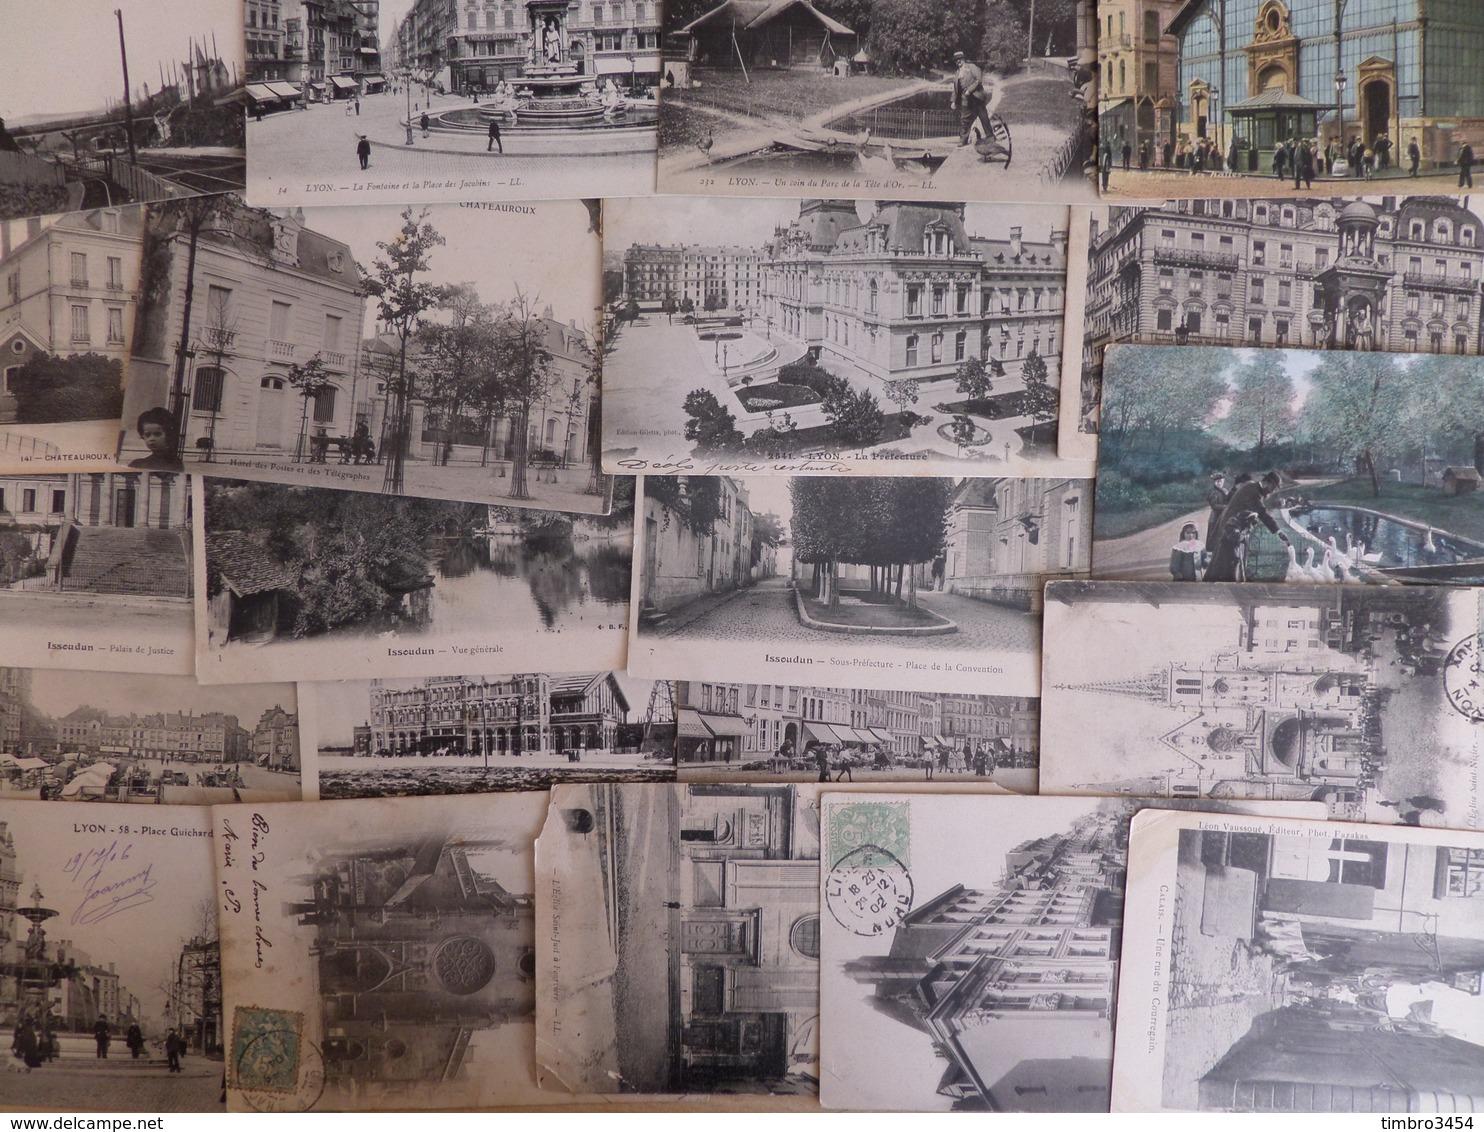 France Superbe Lot/vrac De + De 1000 Cartes Postales 1900/1915 Environ. Très Varié Avec De Bonnes Cartes! A Saisir! - Cartes Postales